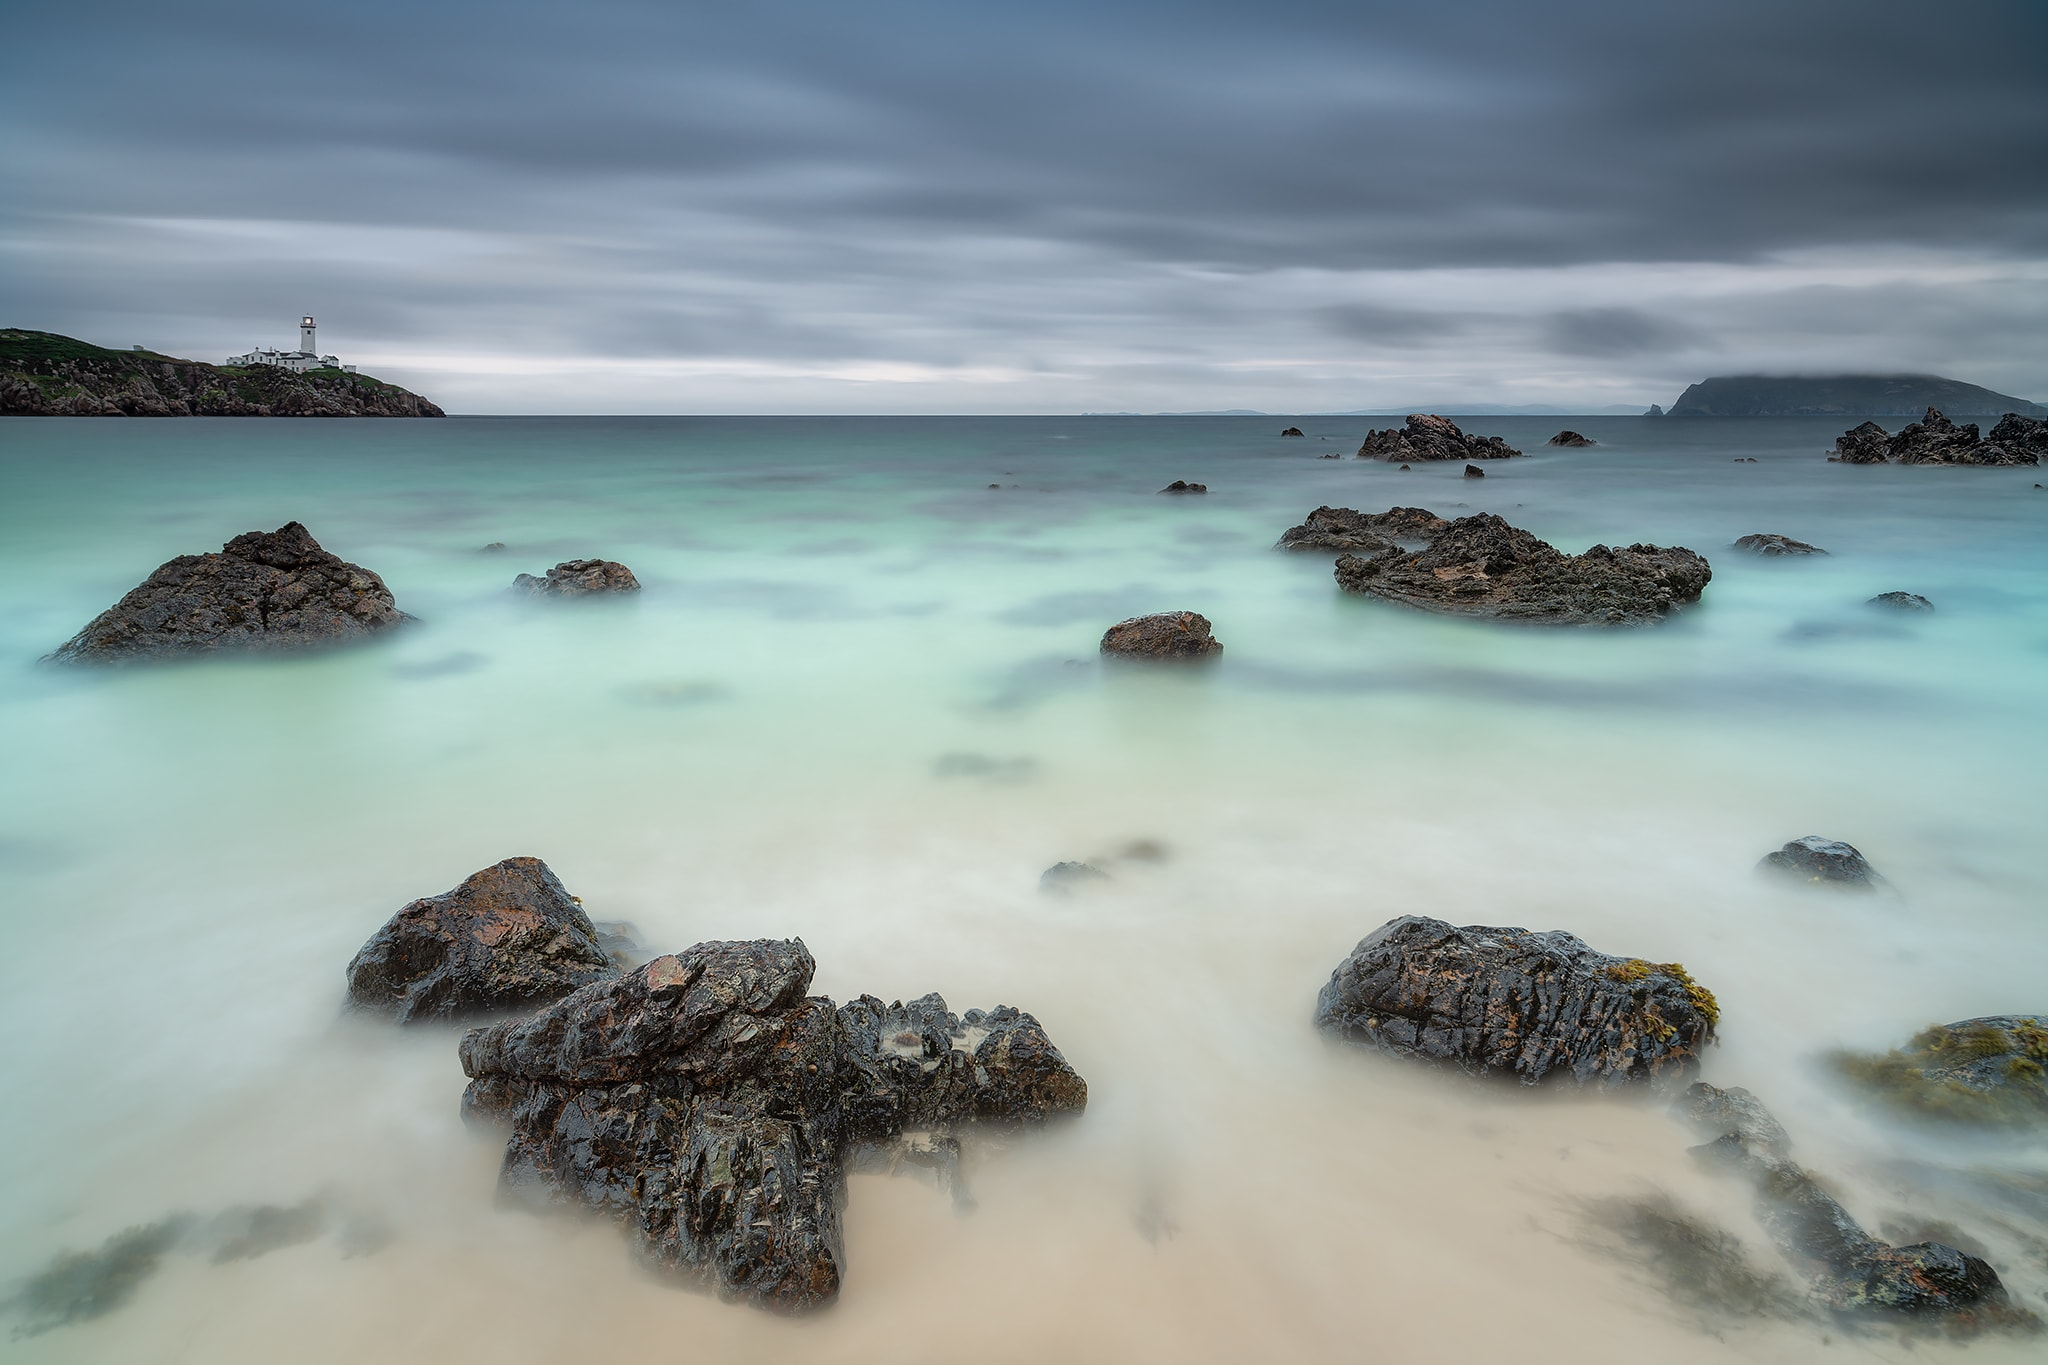 Francesco Gola Ireland Donegal Fanad Head Lighthouse Long Exposure Seascape